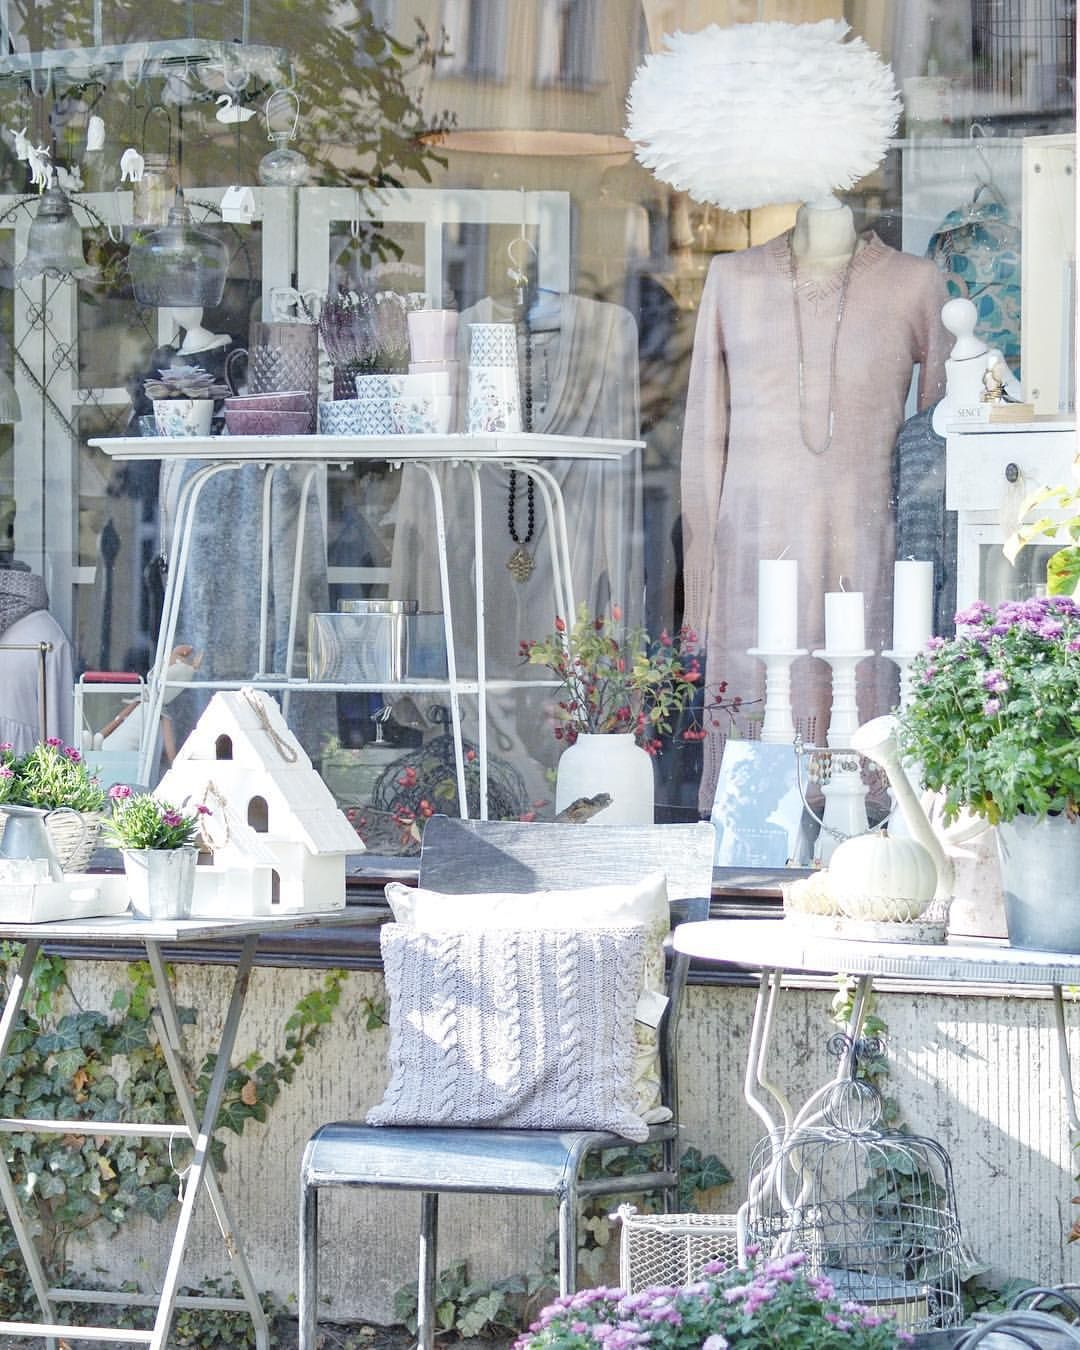 Nordic Home Schaufenster Update Herbst Kuno Fischer Strasse